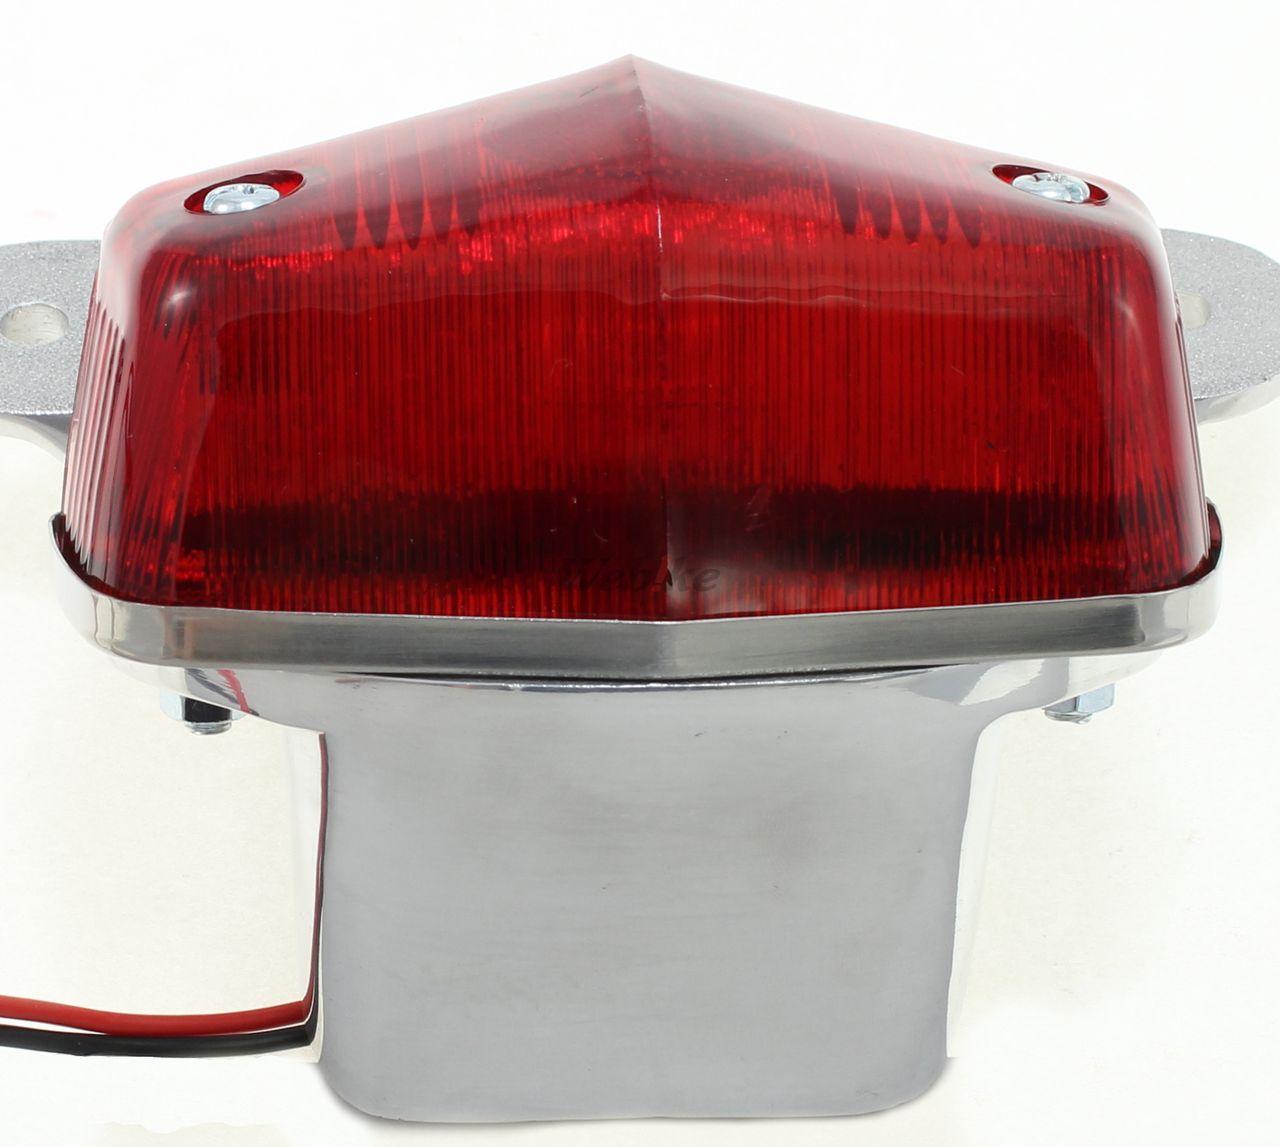 【POSH】Lucas 型式 尾燈 套件 - 「Webike-摩托百貨」